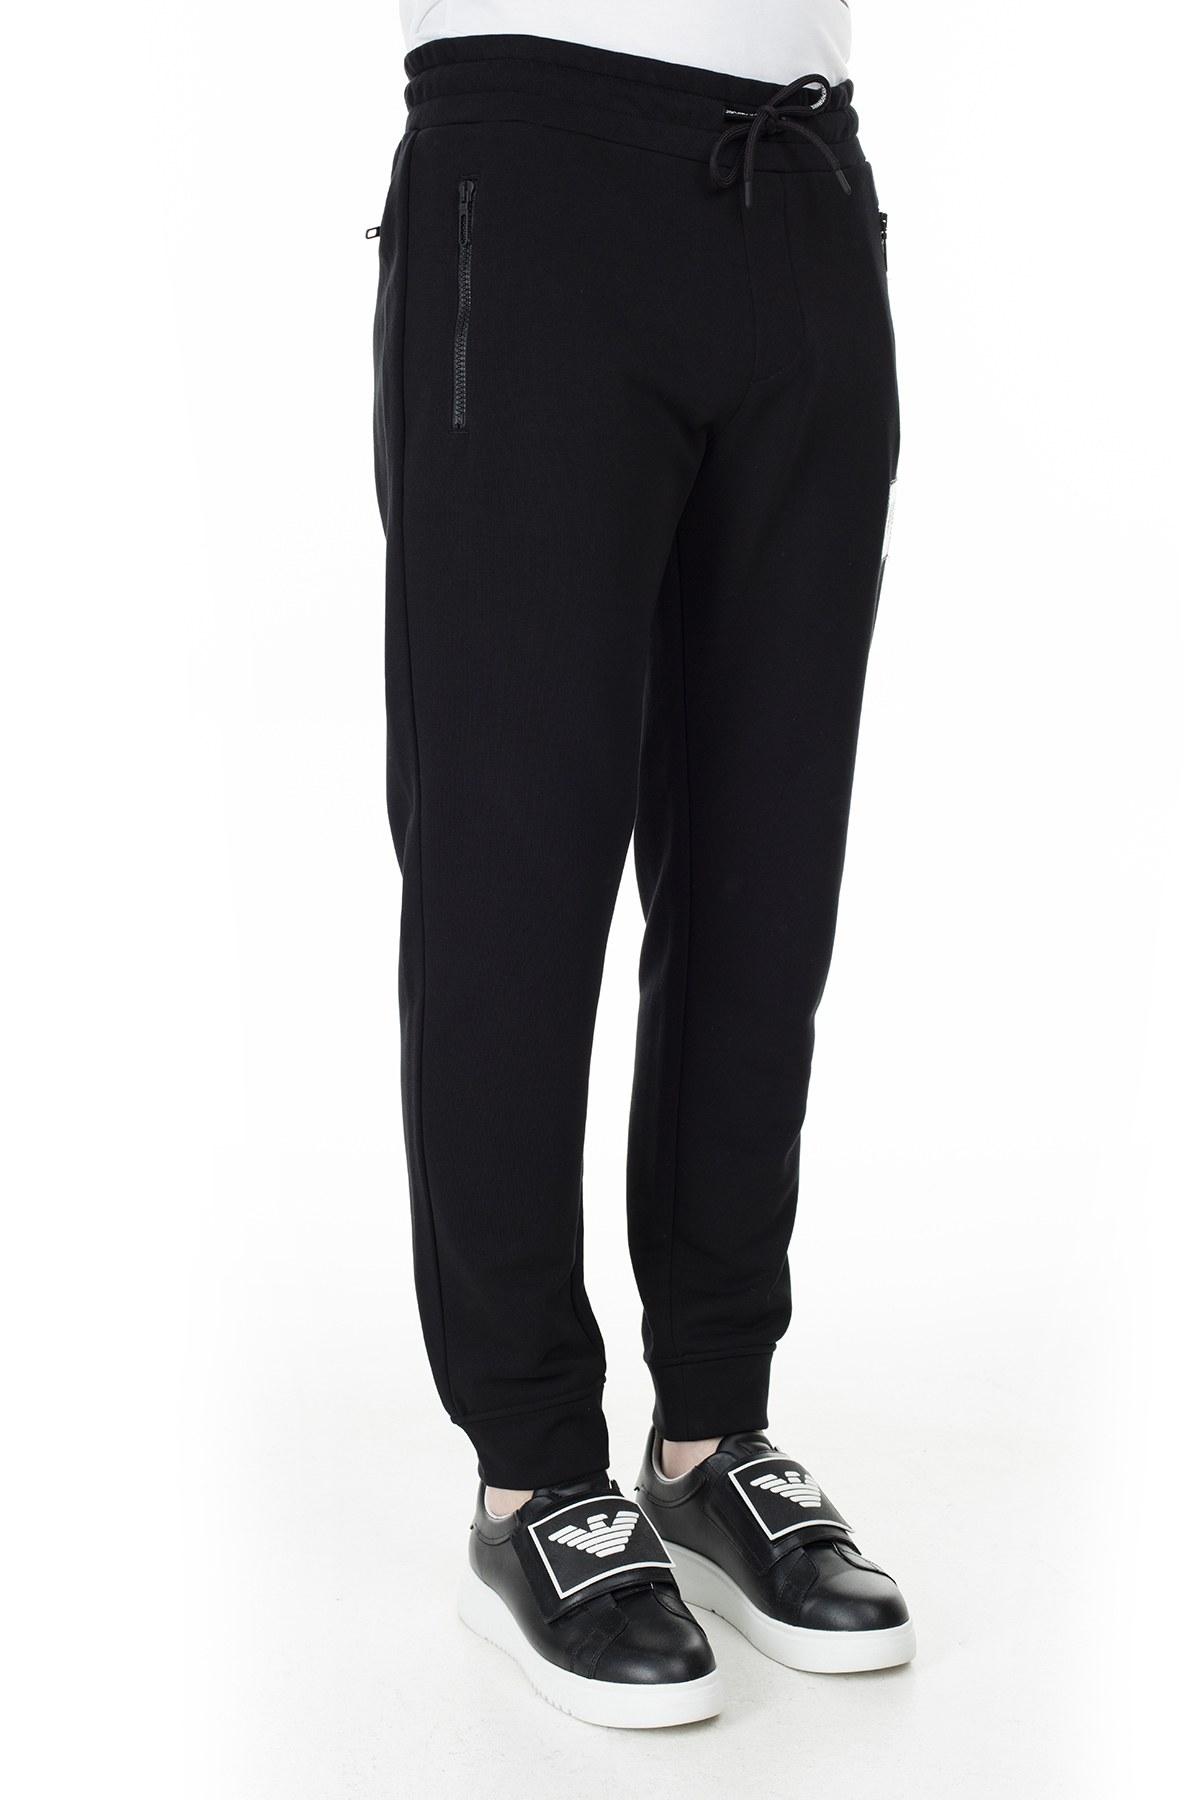 Emporio Armani Regular Fit Erkek Pantolon S 6G1P98 1J36Z 0999 SİYAH